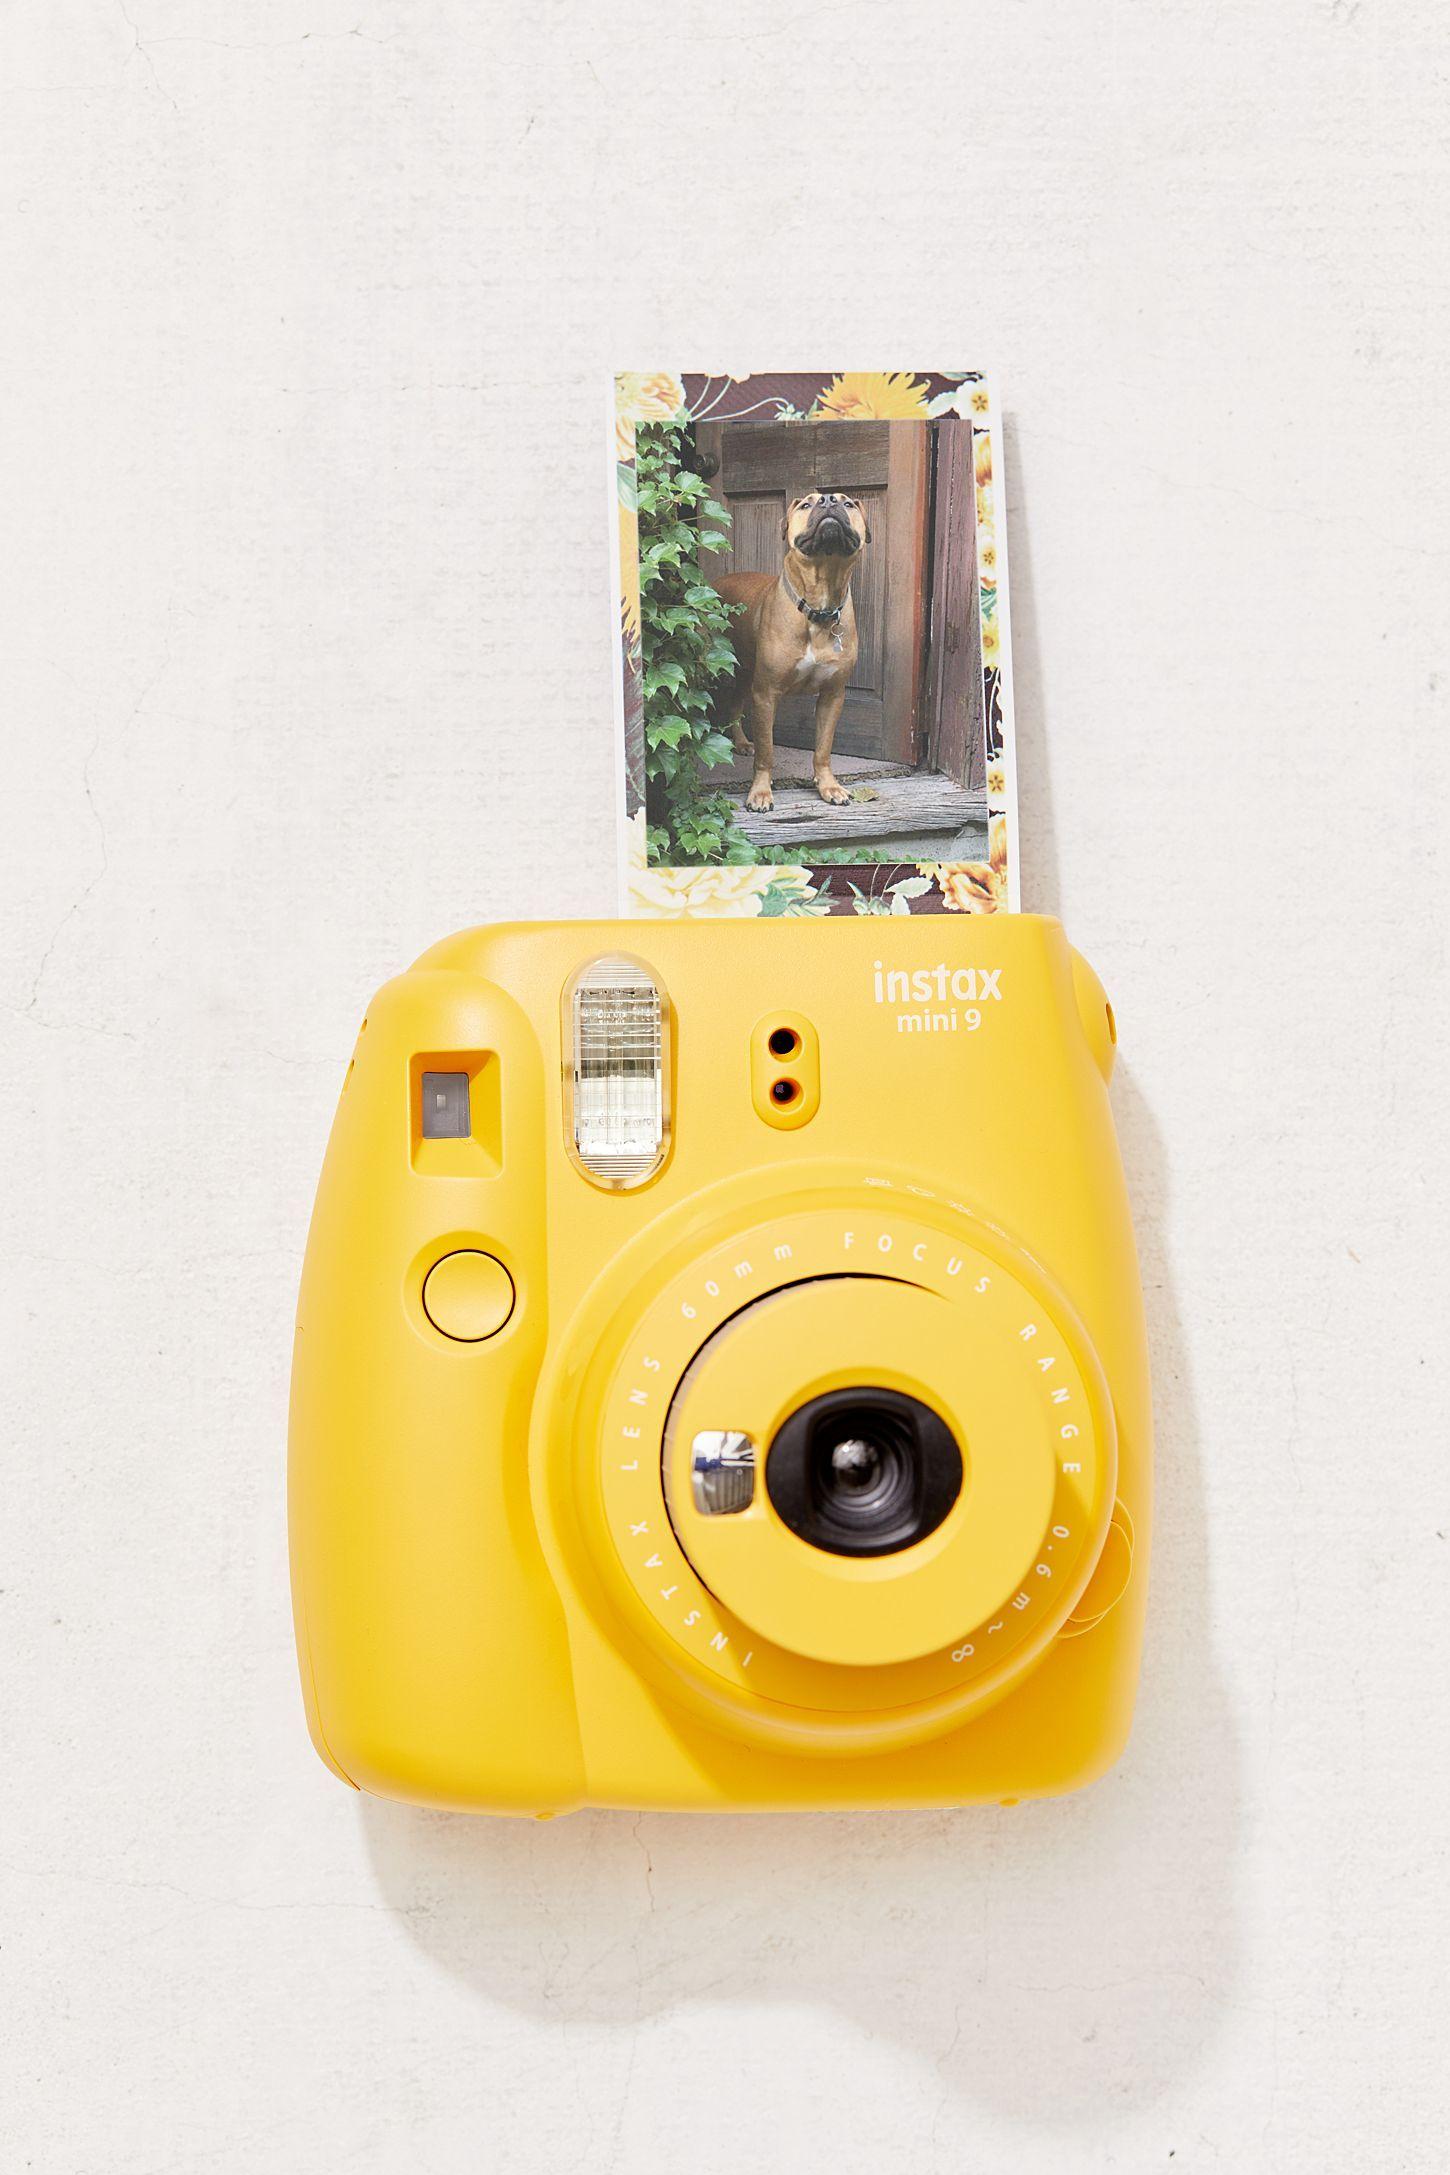 fc422b4b19de4 Slide View  5  Fujifilm UO Exclusive Instax Mini 9 Instant Camera